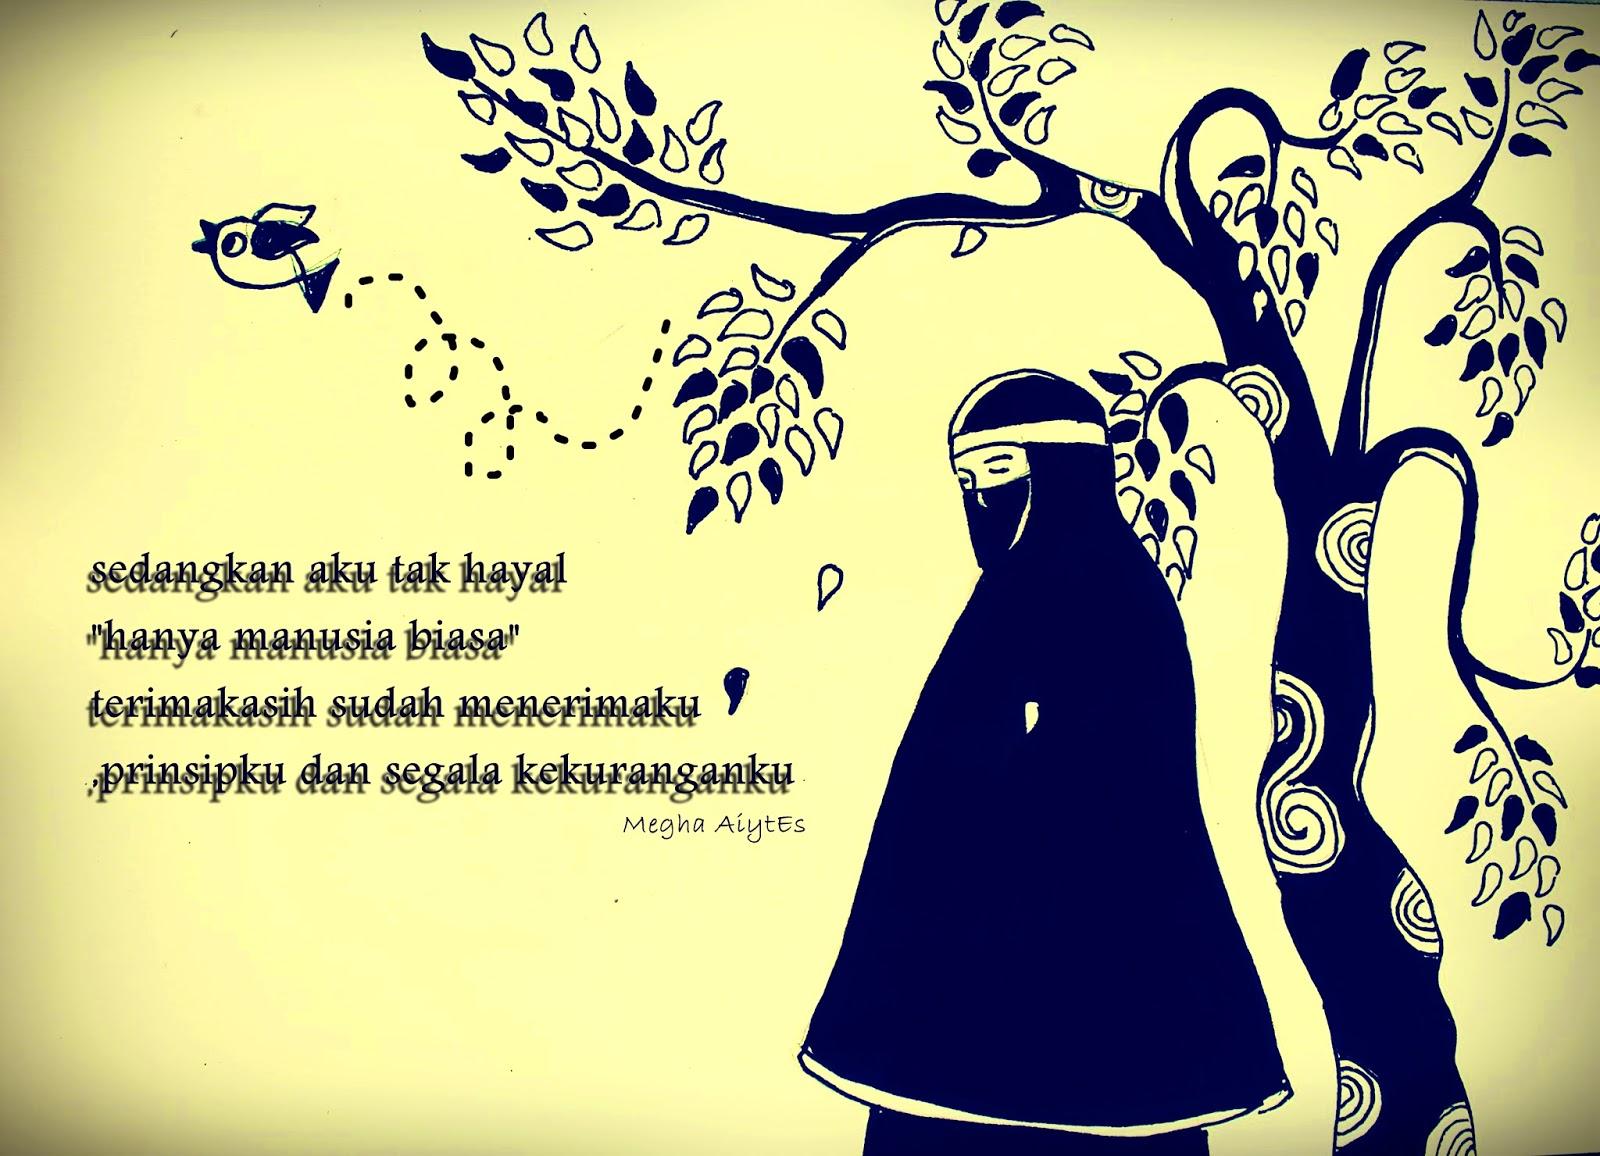 Gambar Kartun Muslimah Bercadar Prinsip Seorang Muslimah Kartun